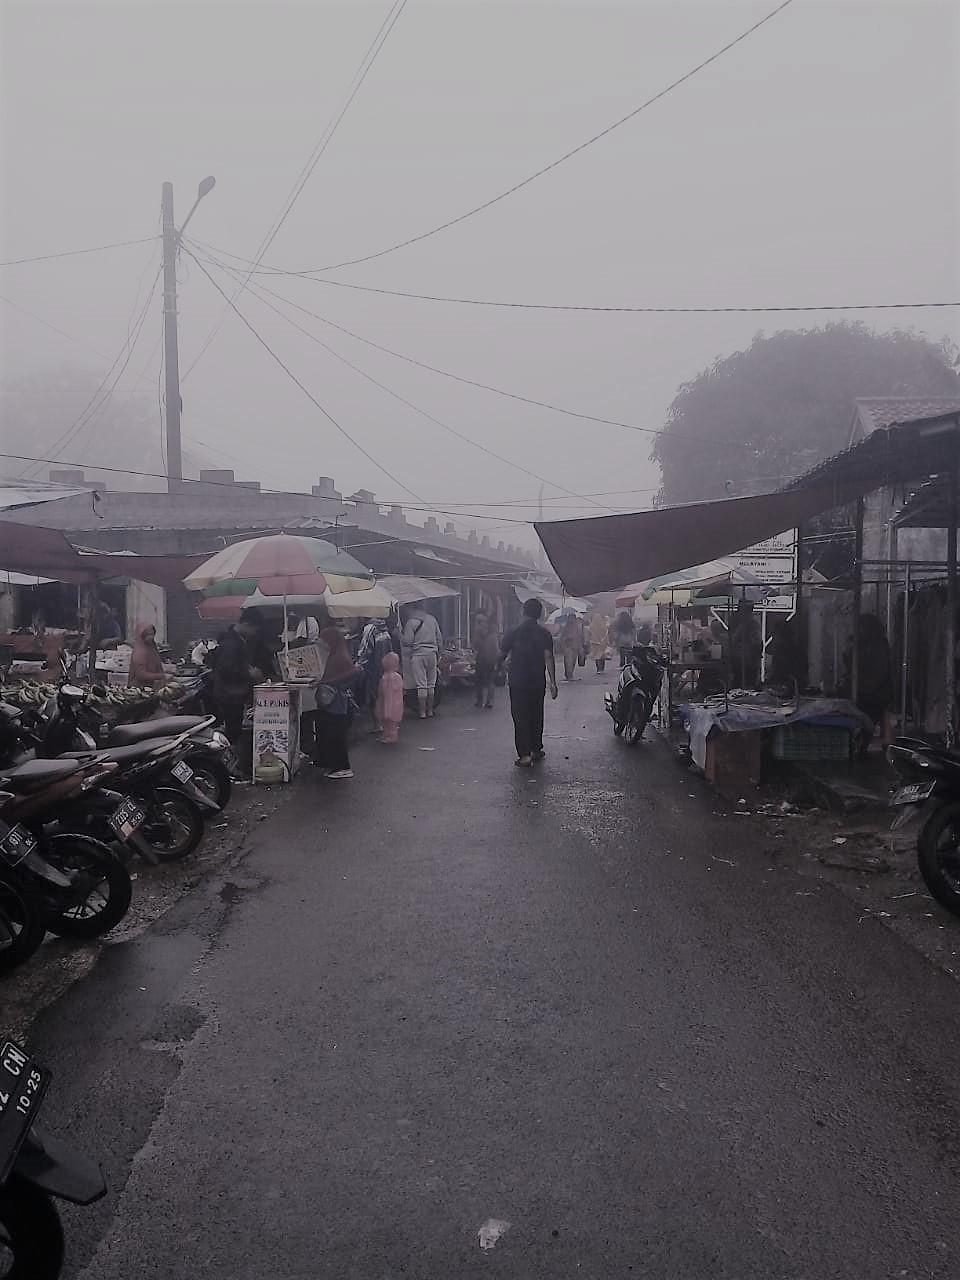 Omset Para Pedagang di Pasar Desa Taringgul Tonggoh Semakin Menurun